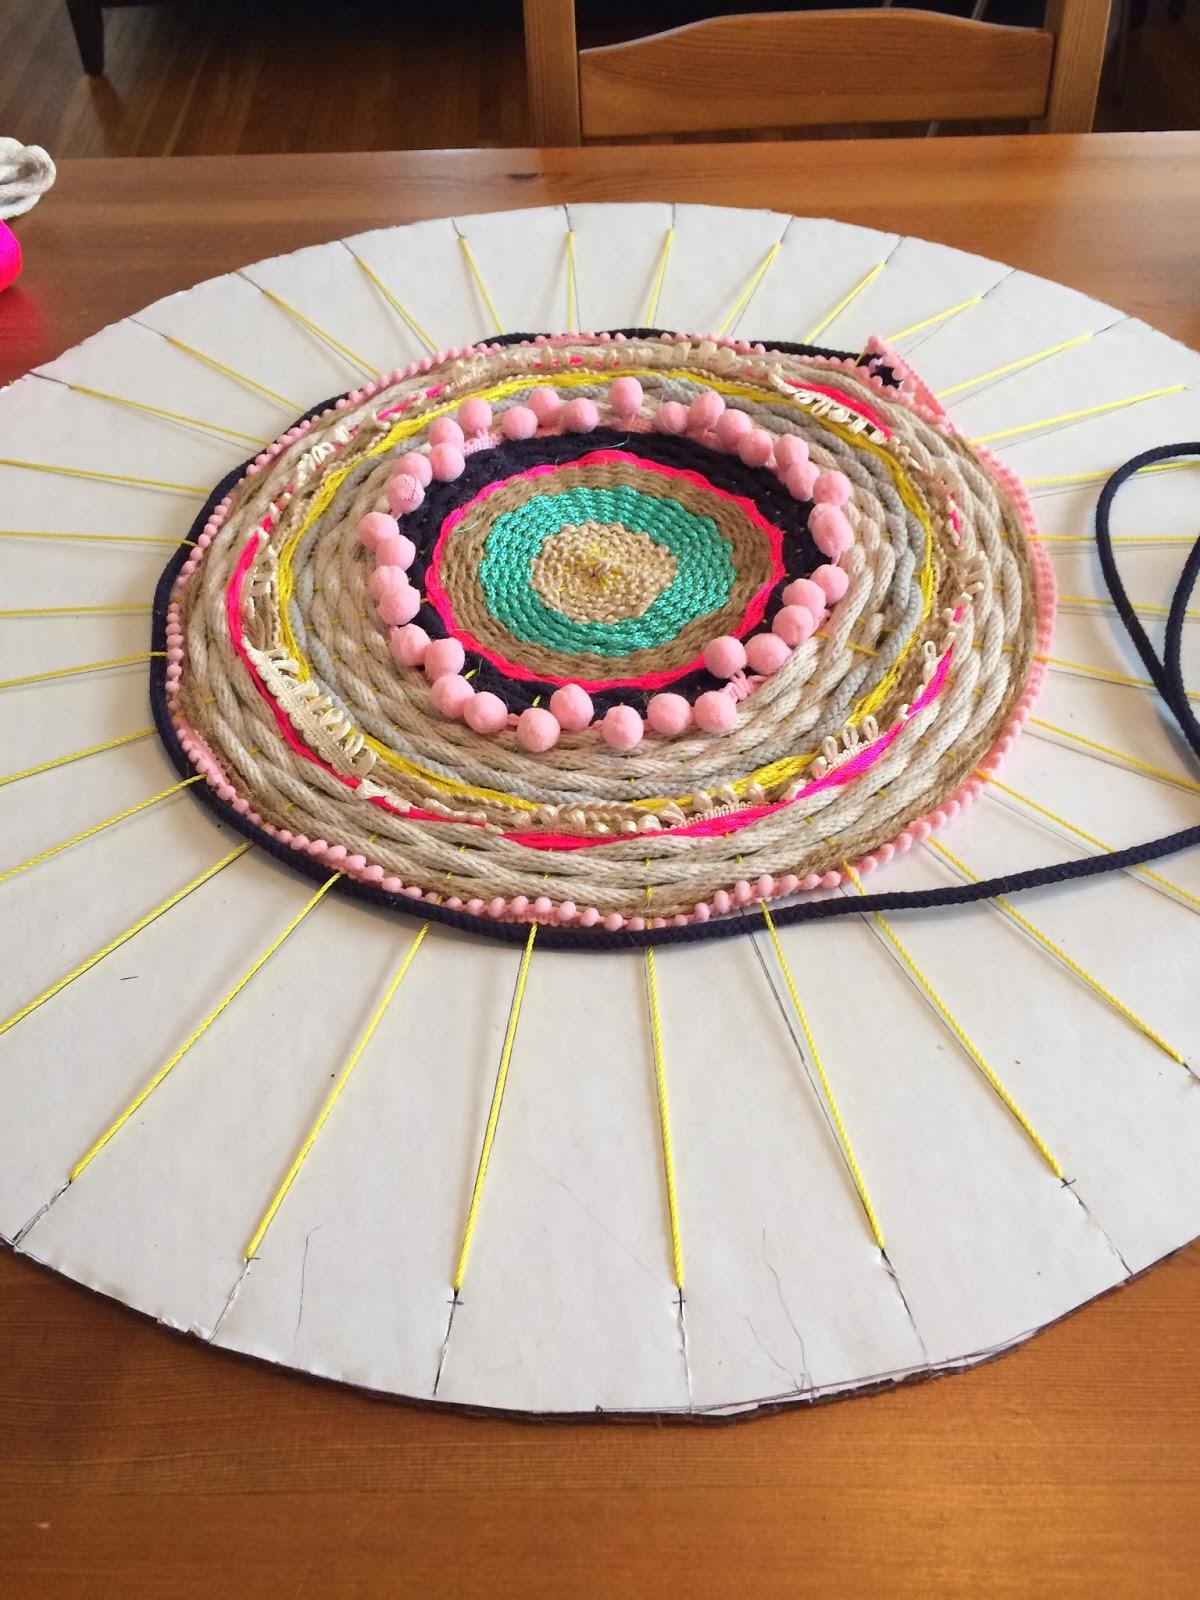 DIY Woven Pom-pom Rope Rug